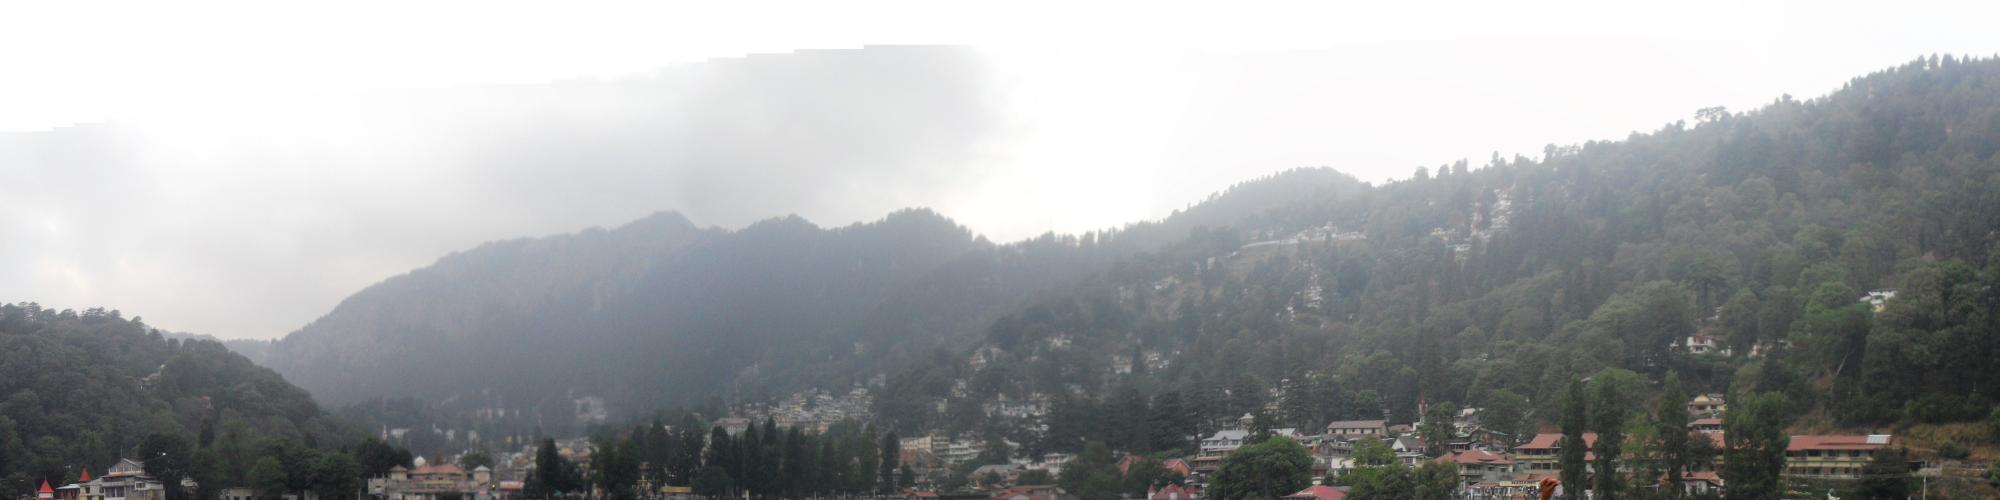 *** Индия, Гималаи, Найнитал, Баджери - Nainital ***